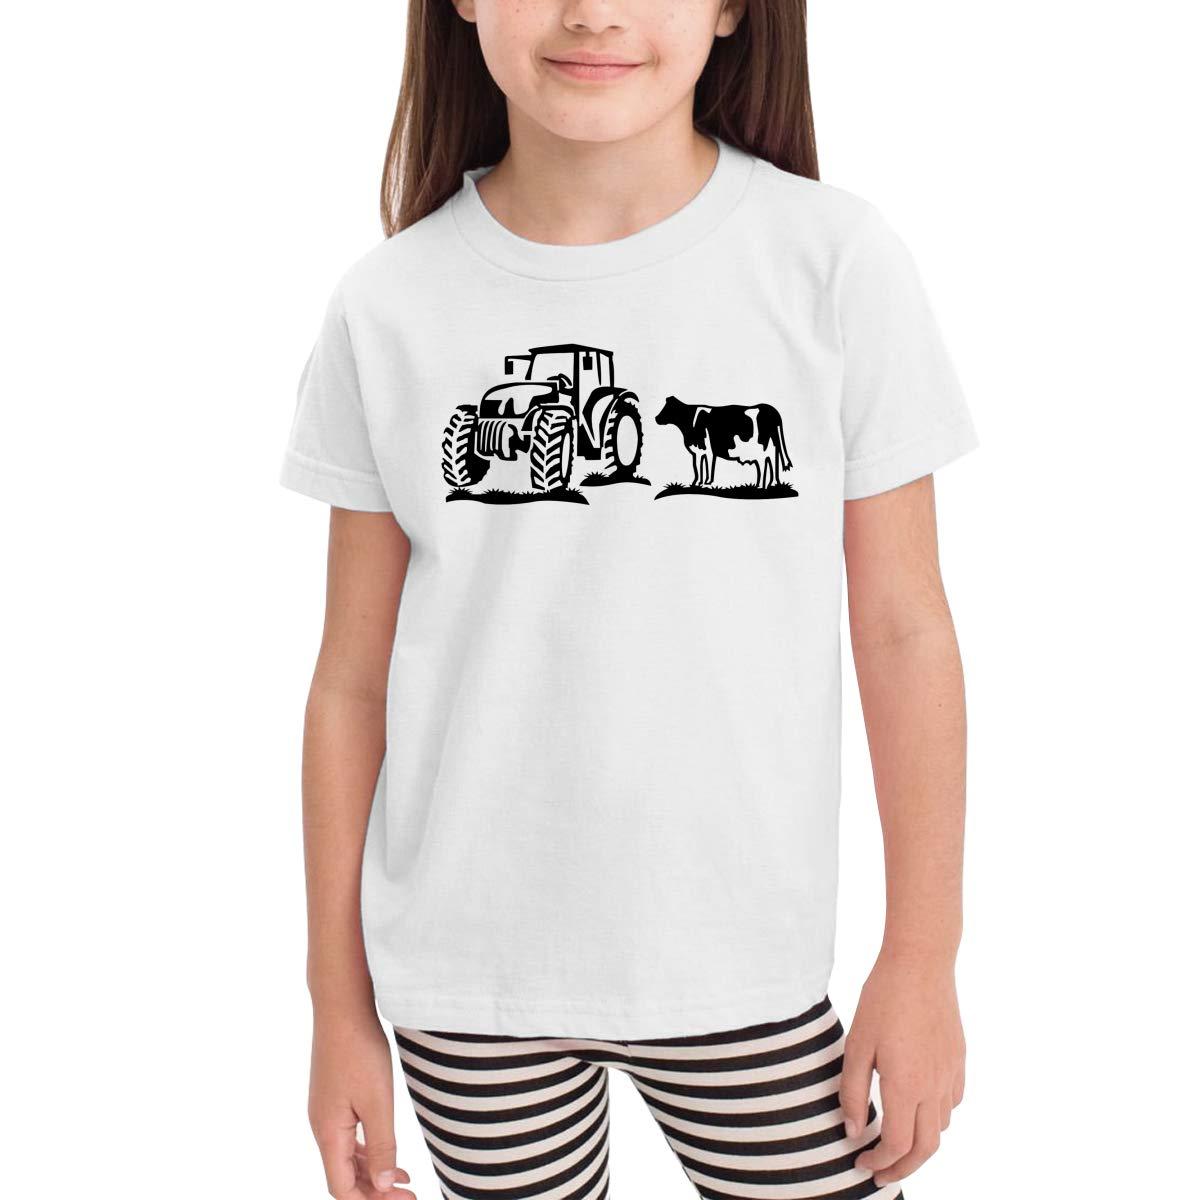 Kinder Premium Unisex Youths Short Sleeve T-Shirt Kids T-Shirt Tops Gray